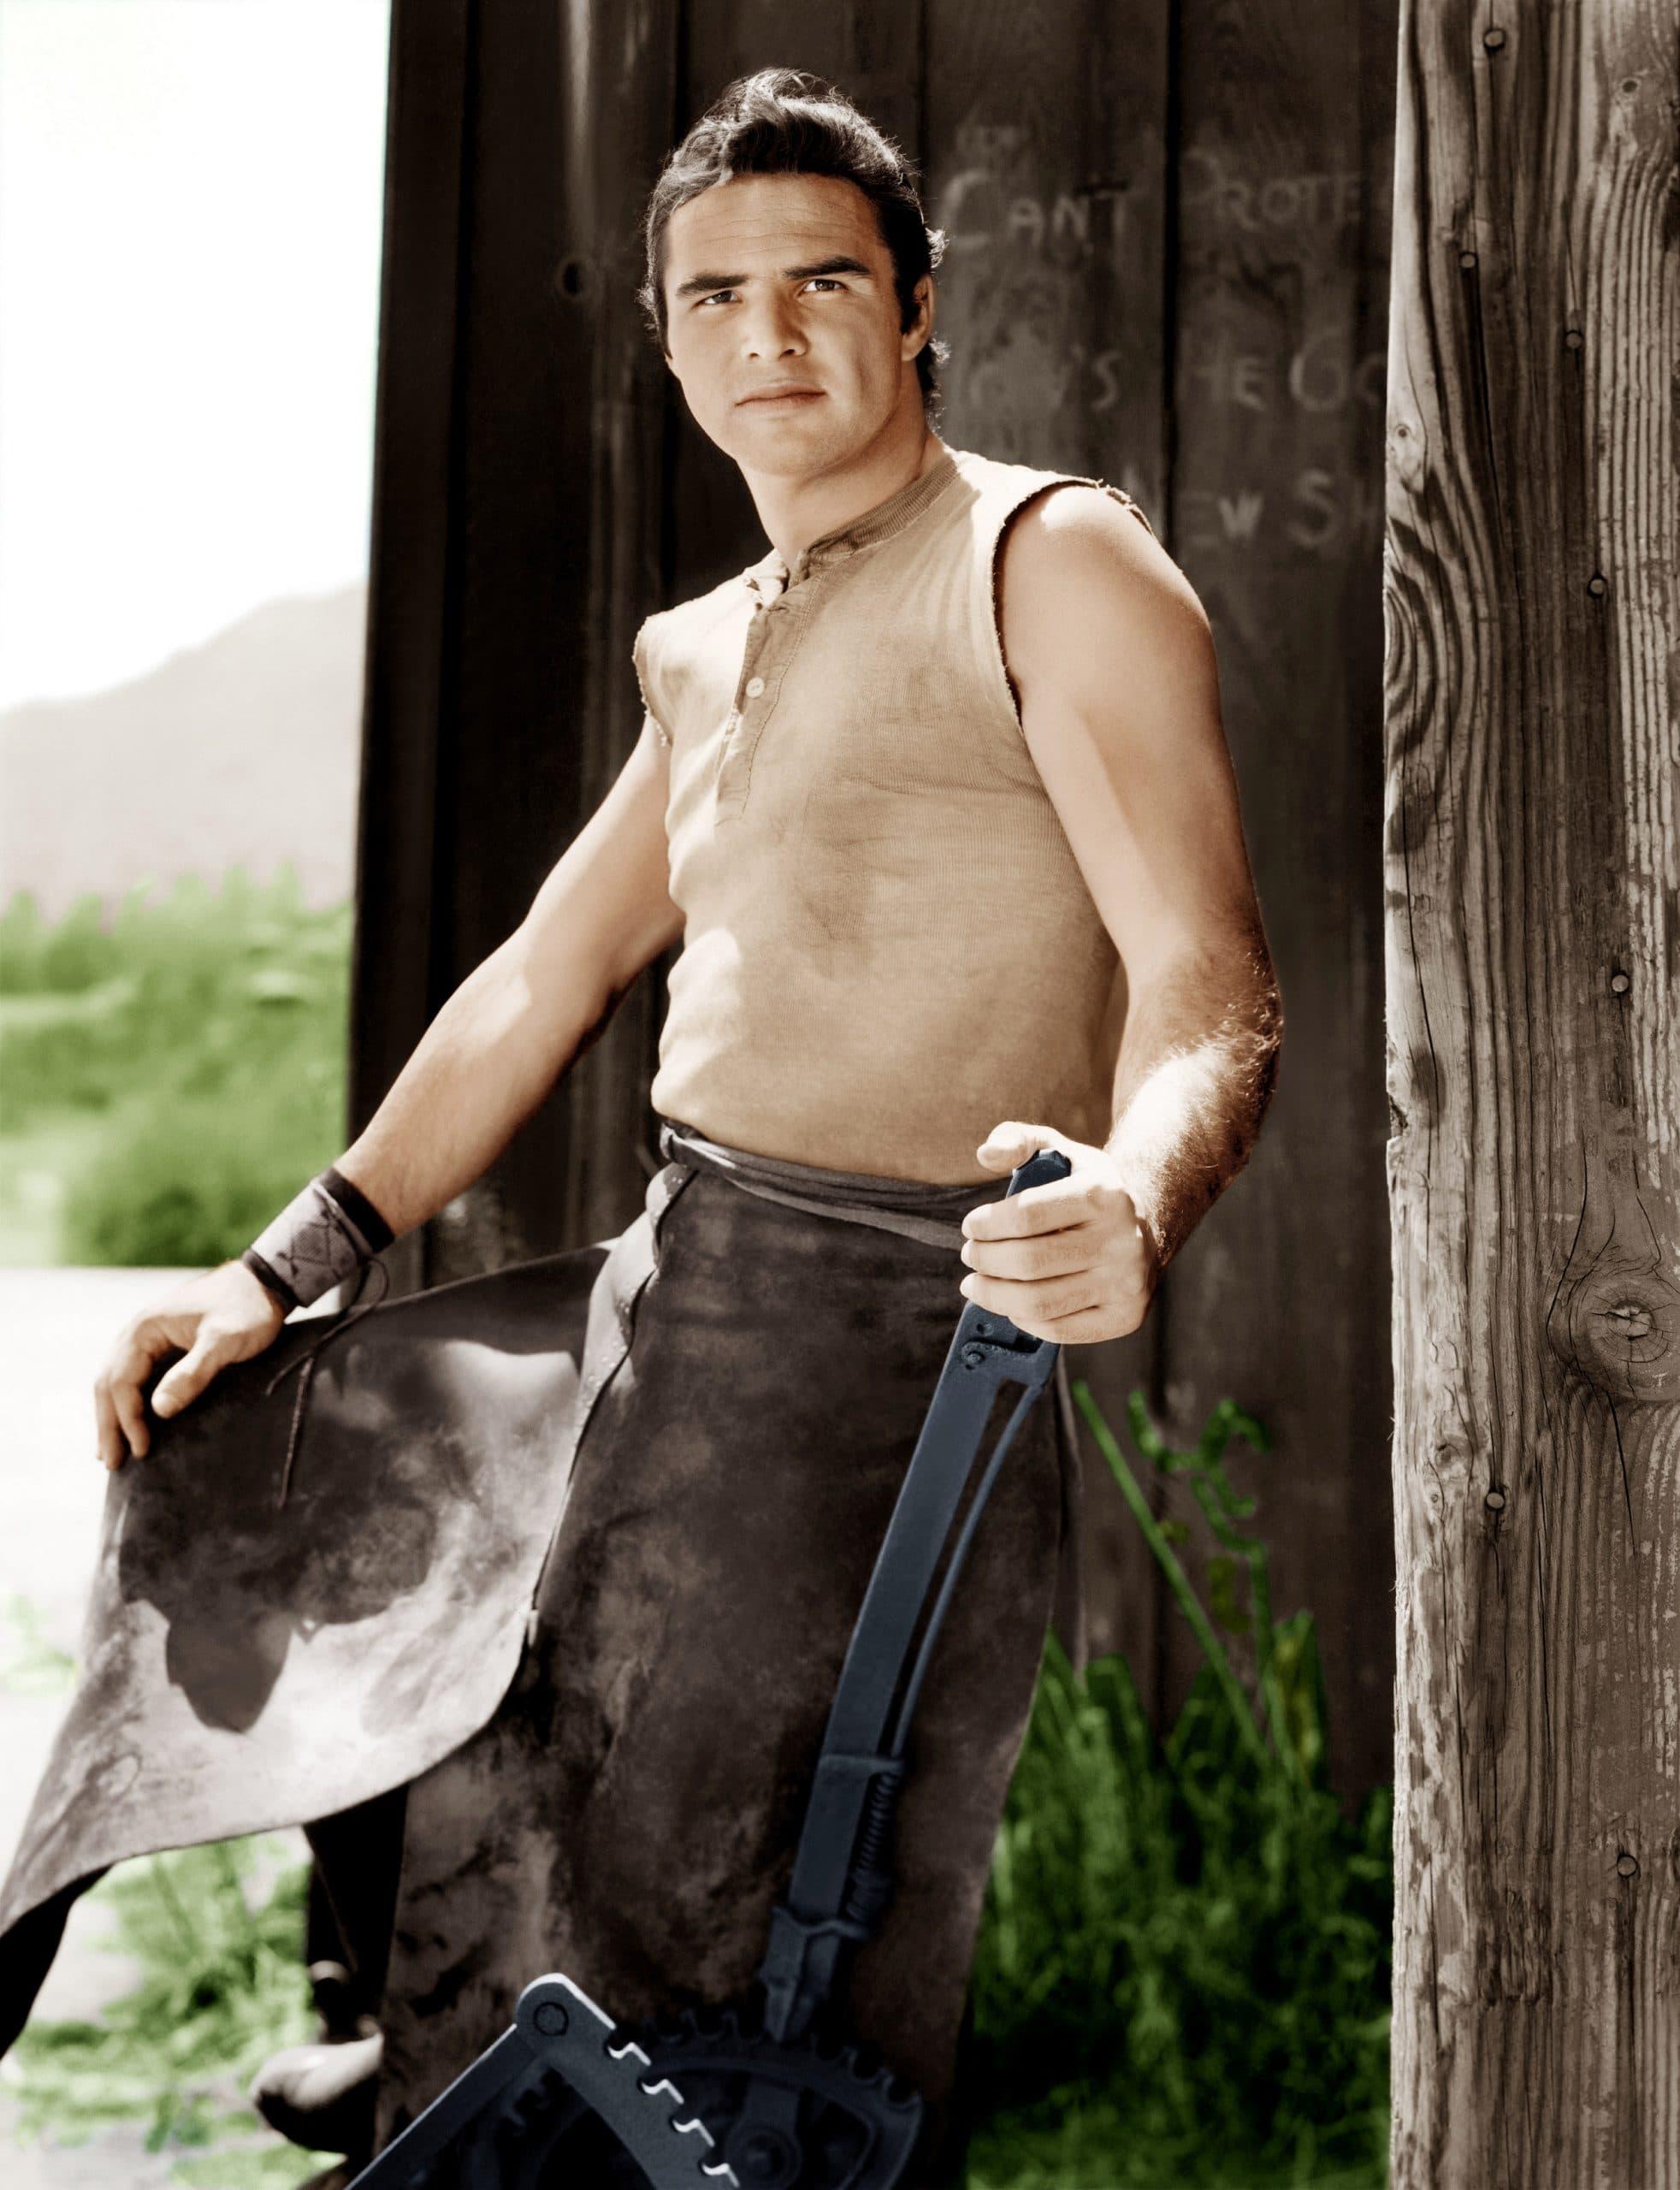 GUNSMOKE, Burt Reynolds, 'Quint Asper